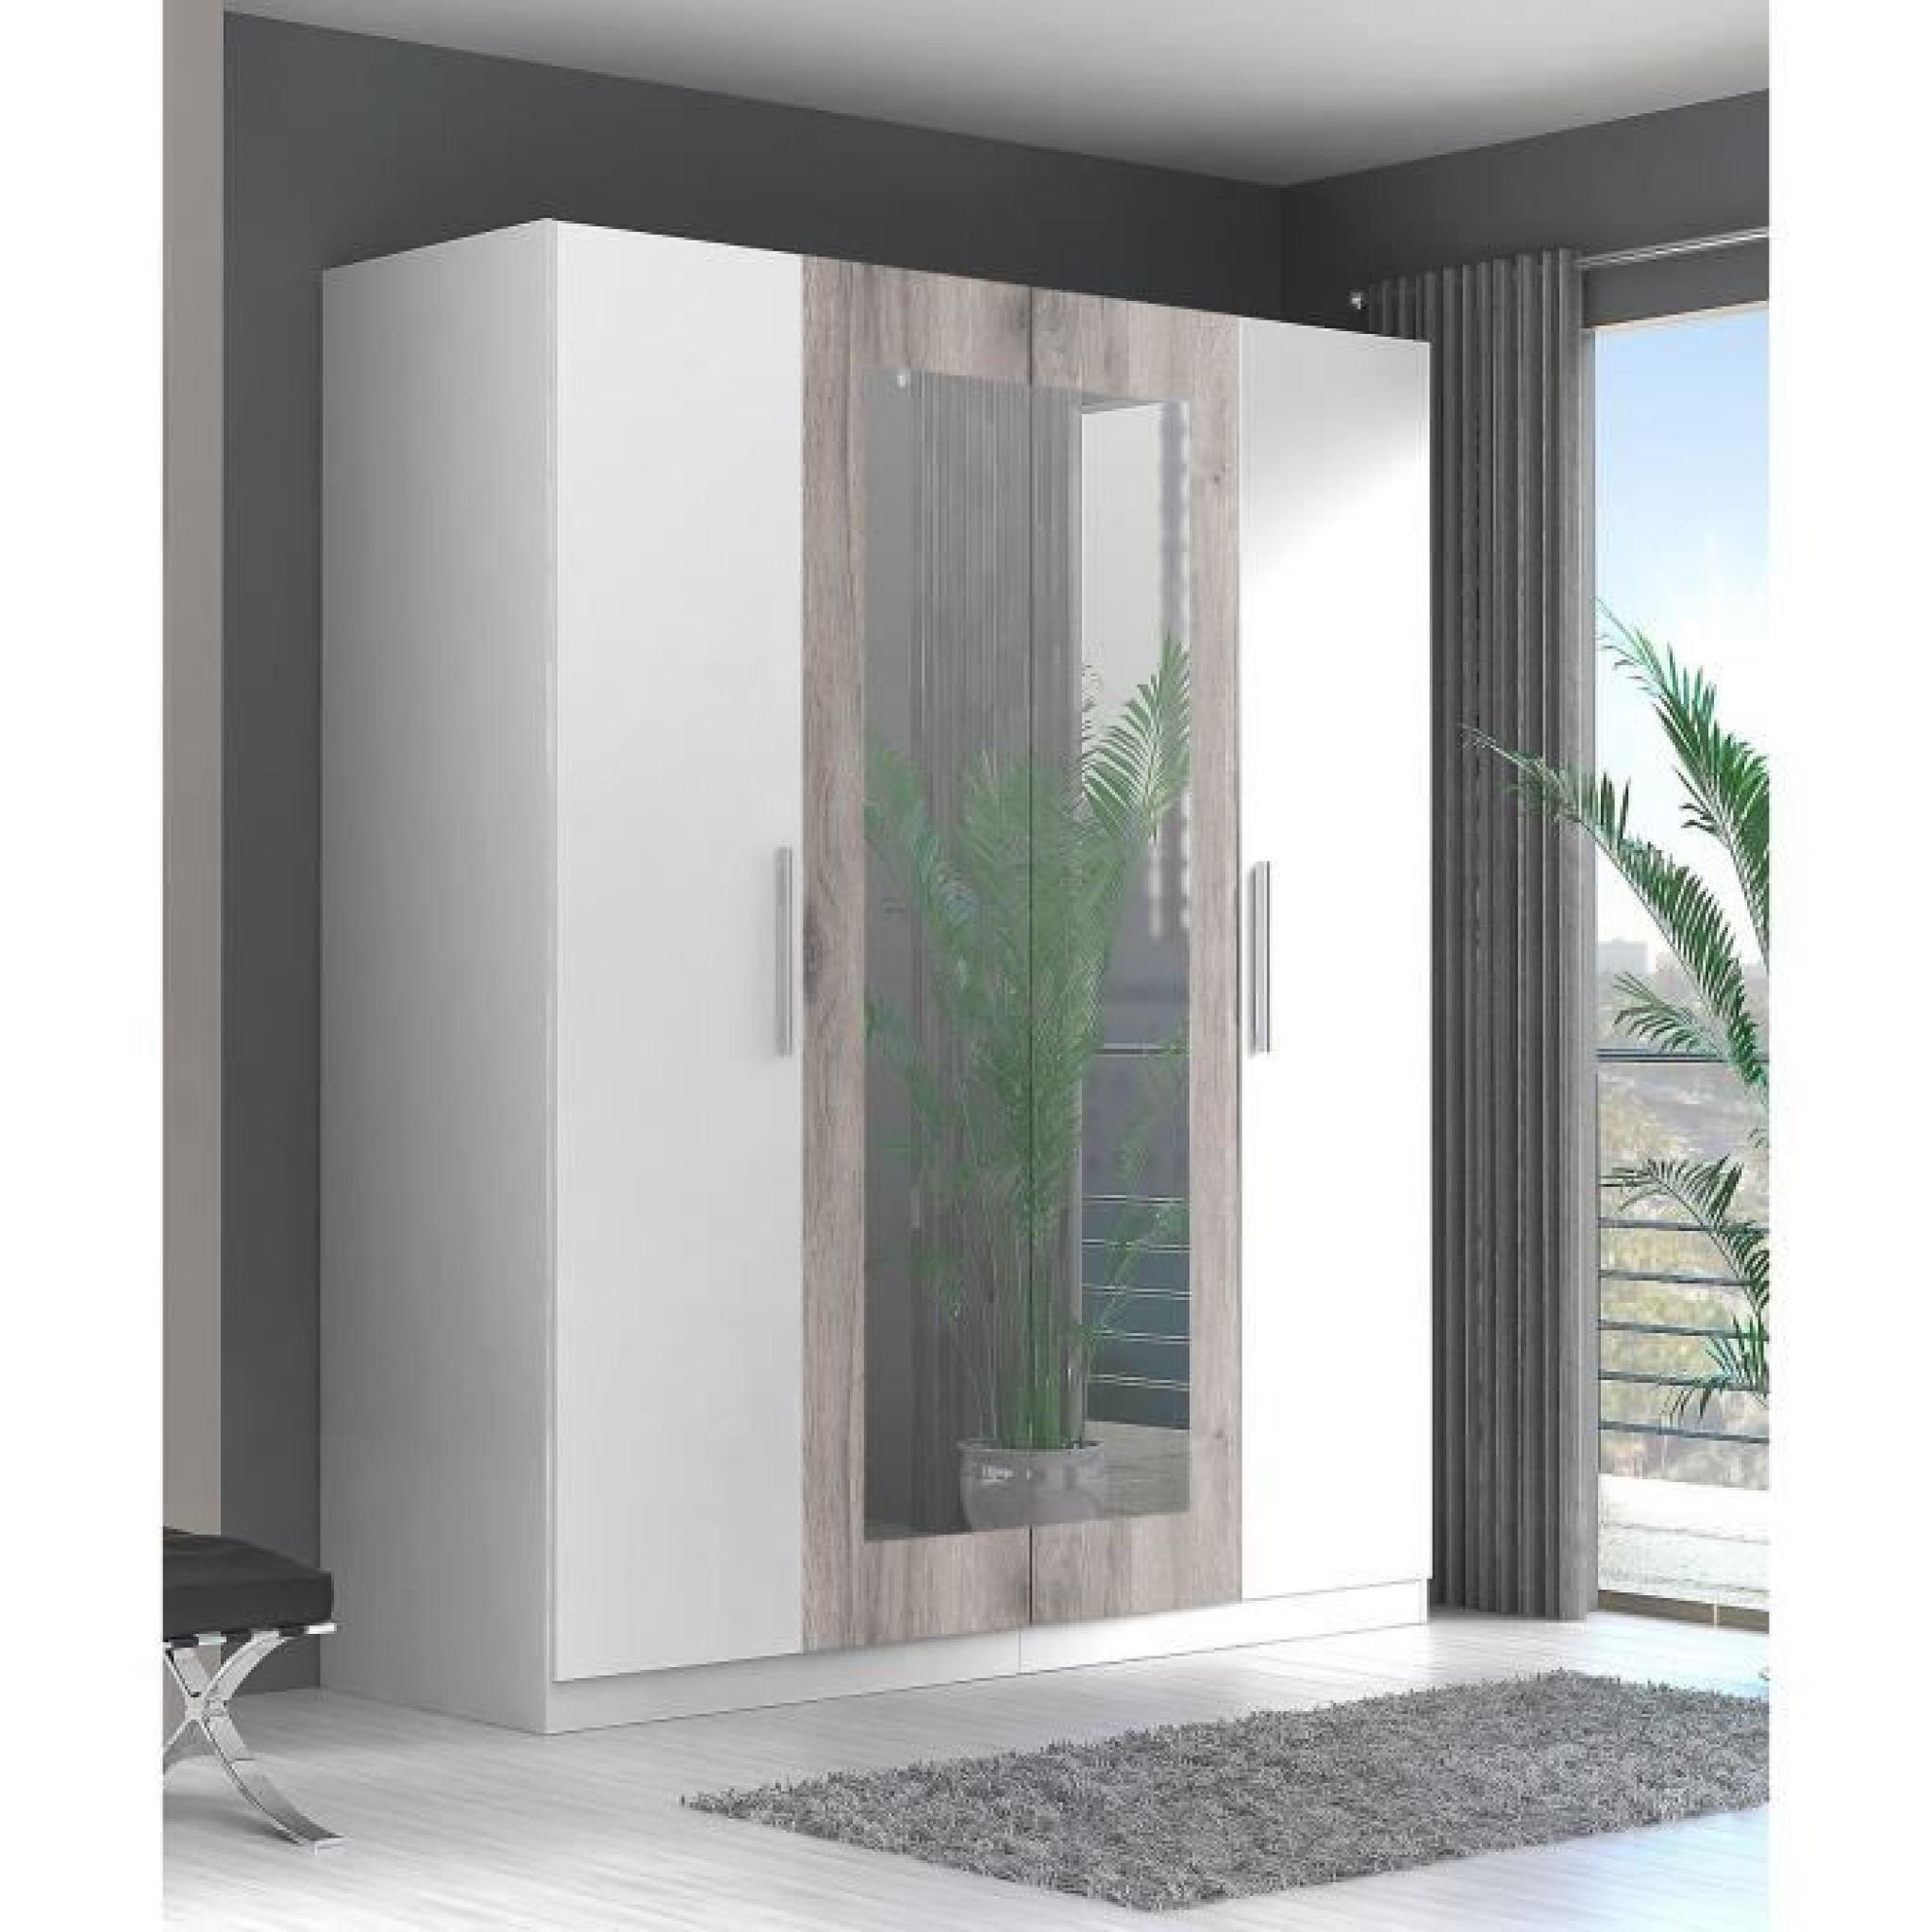 Finlandek armoire de chambre siisti 180 cm blanc et for Armoire chambre 180 cm